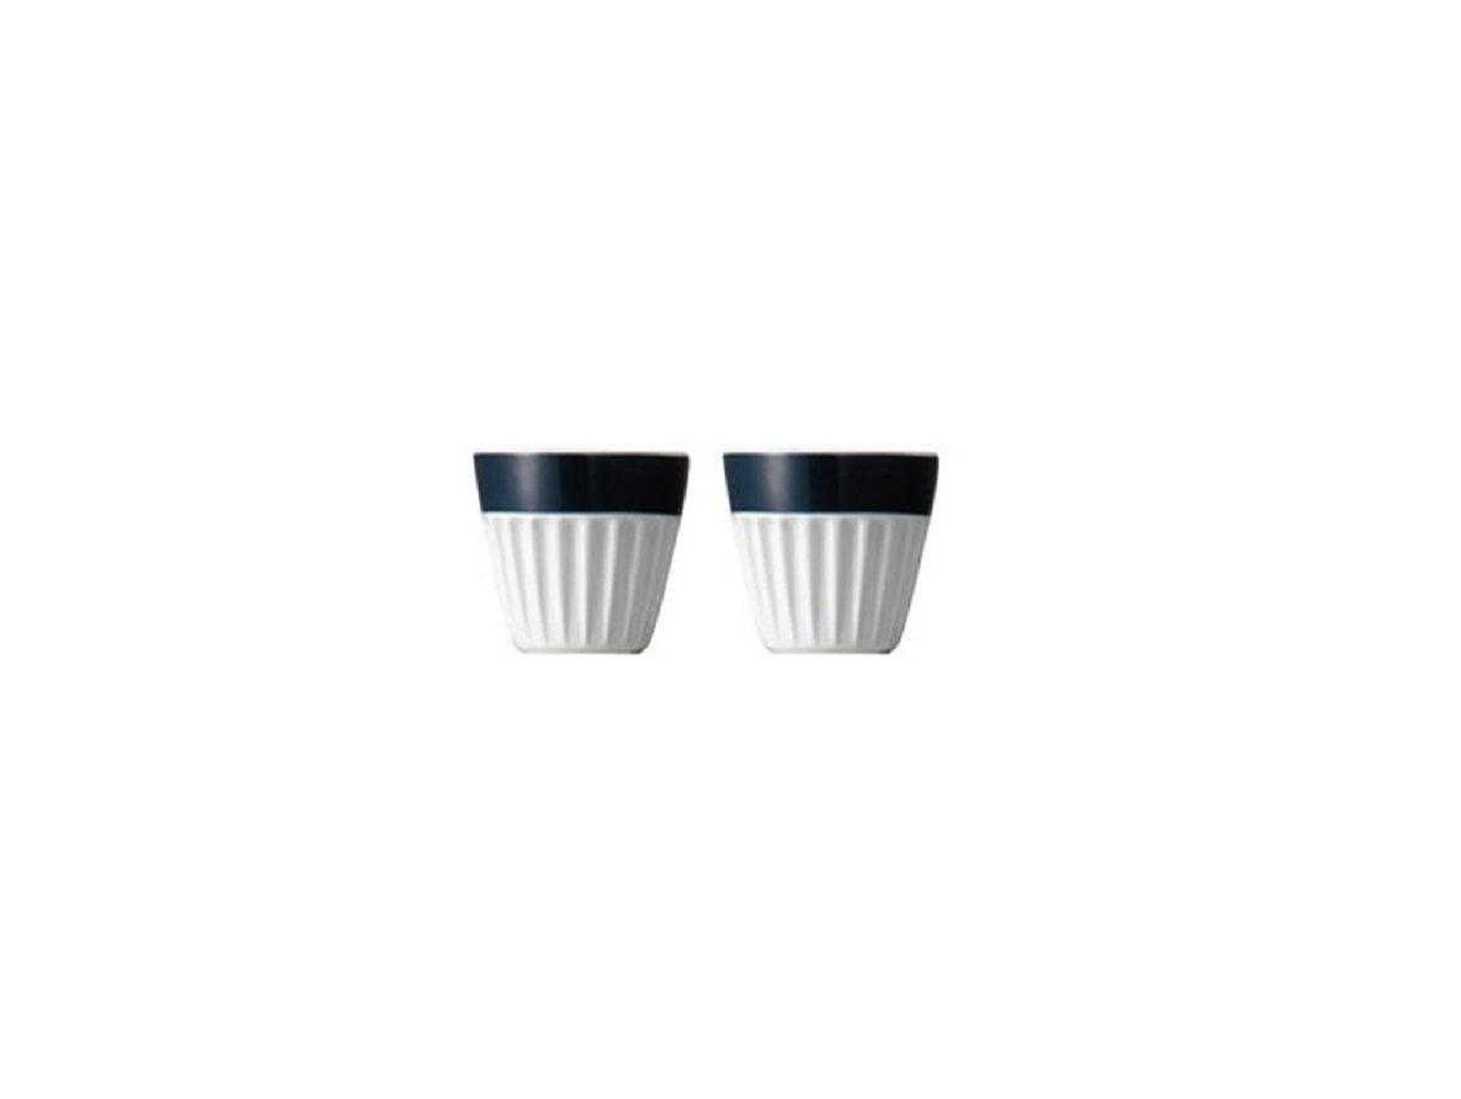 Онлайн каталог PROMENU: Набор чашек для капучино Rosenthal SUNNY DAY, черный, 2 штуки Rosenthal 10850-408519-28391